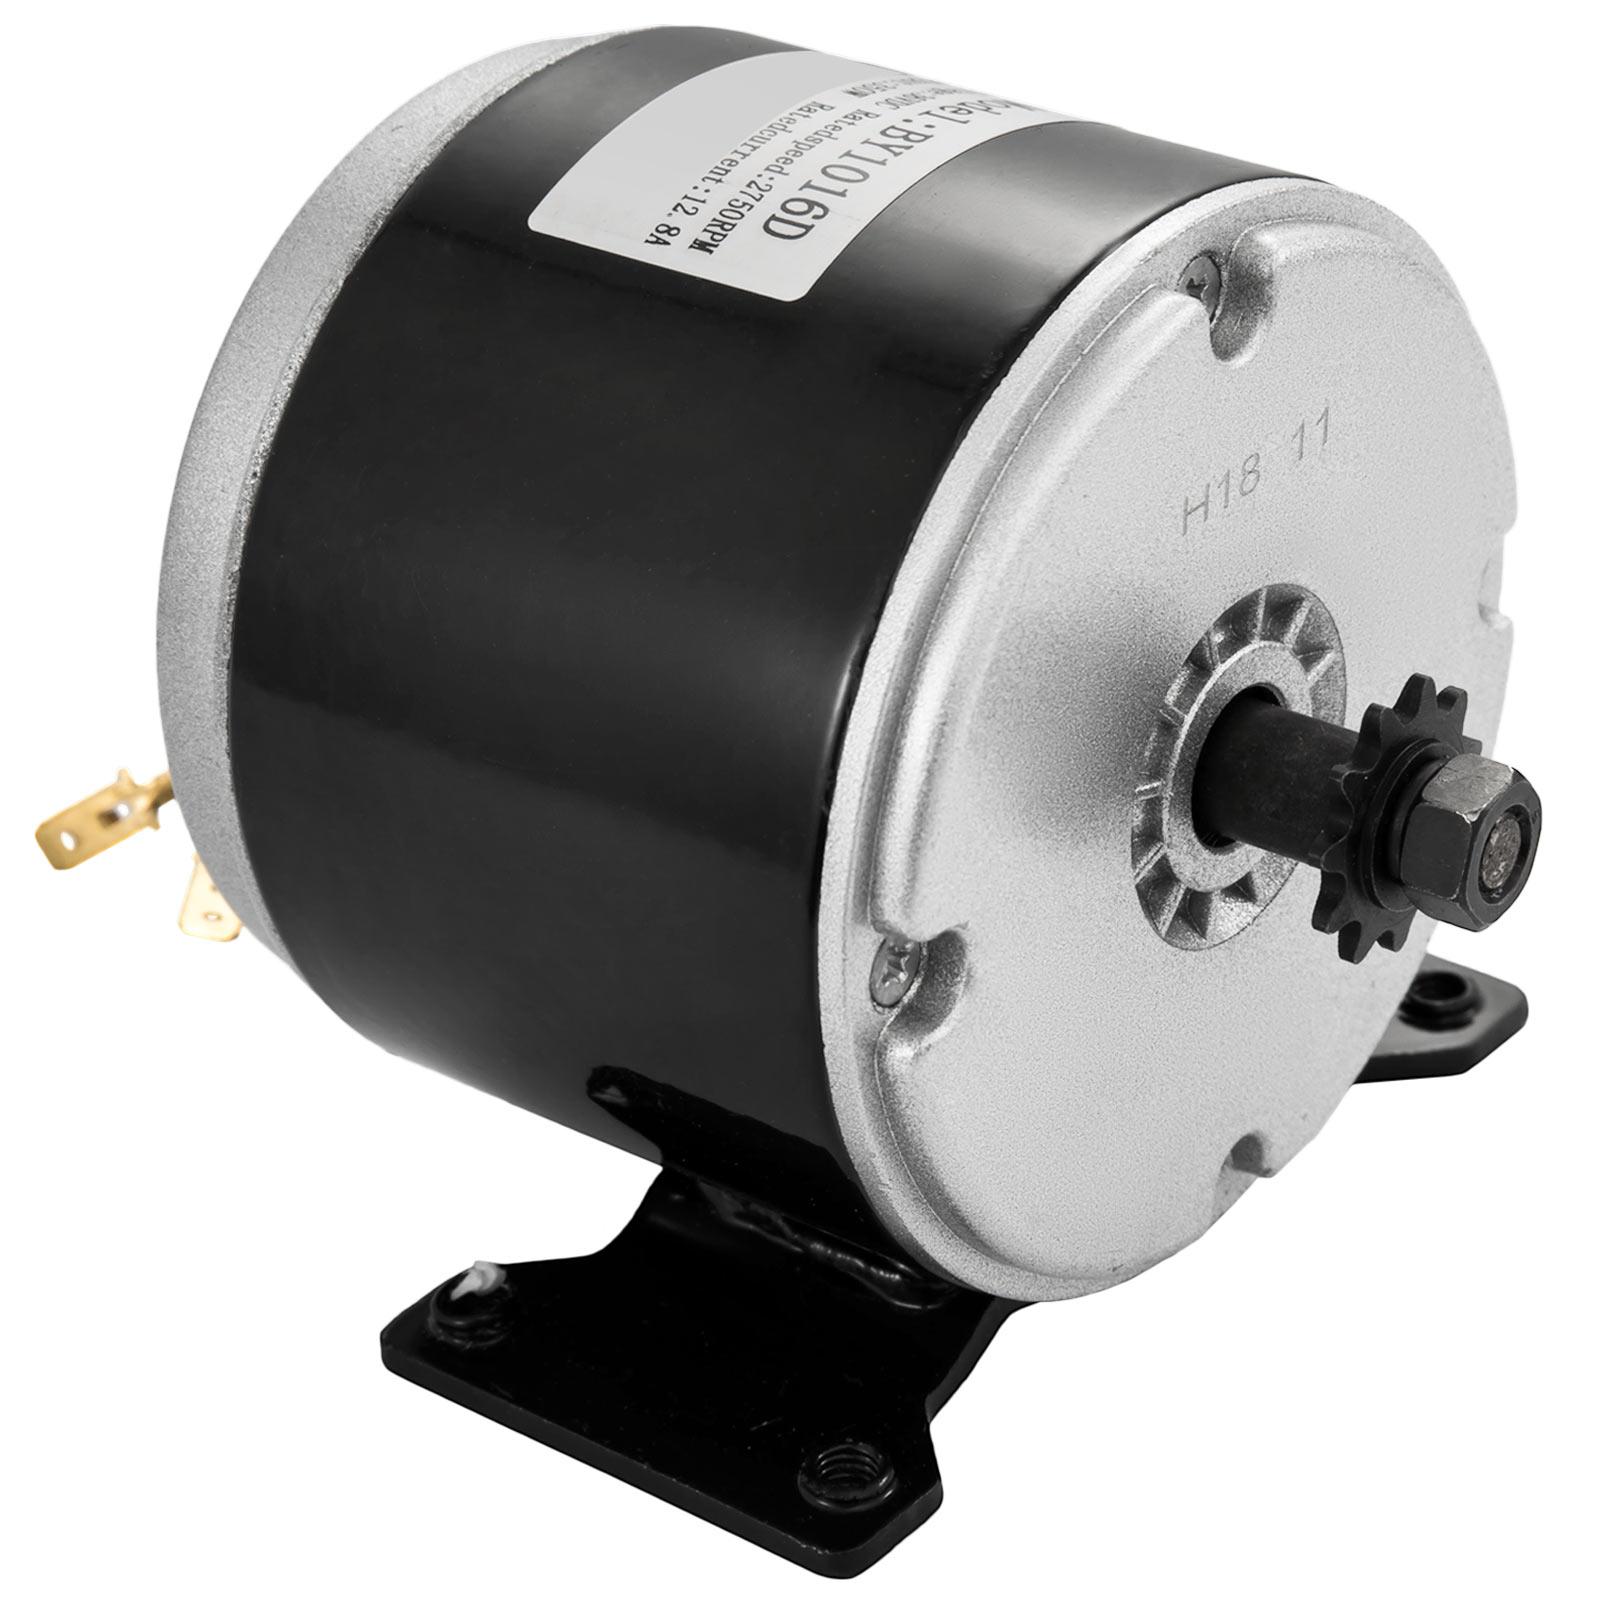 36v-Electric-Motor-controller-throttle-kit-f-Scooter-E-Scooter-ATV-Permanent thumbnail 22